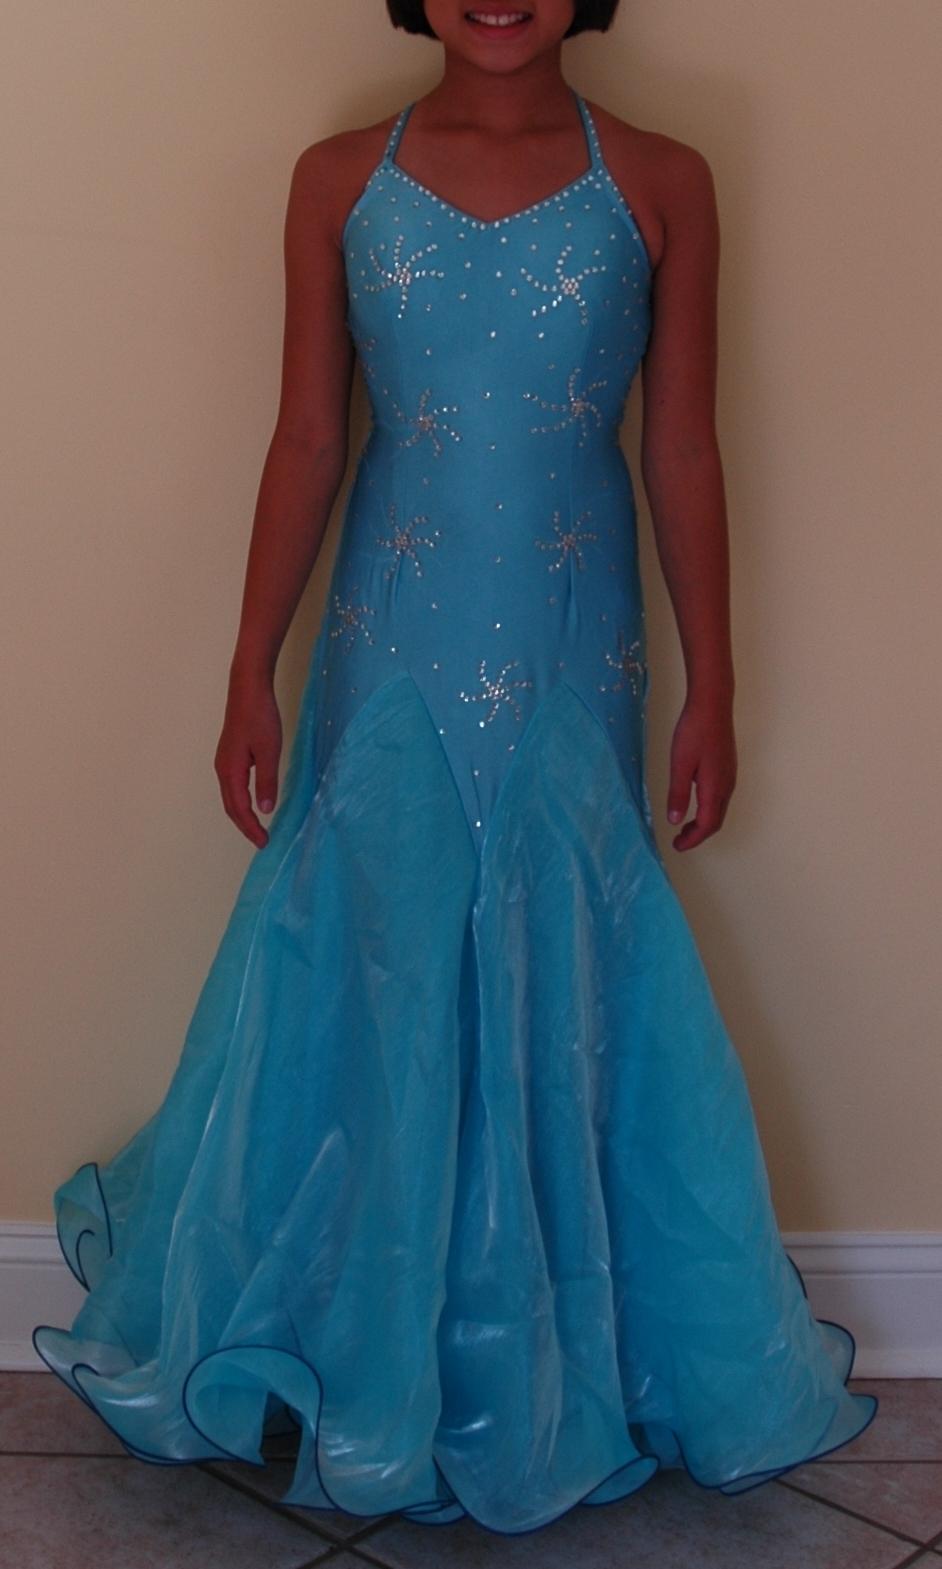 & Kids Ruffle Ballroom Dress